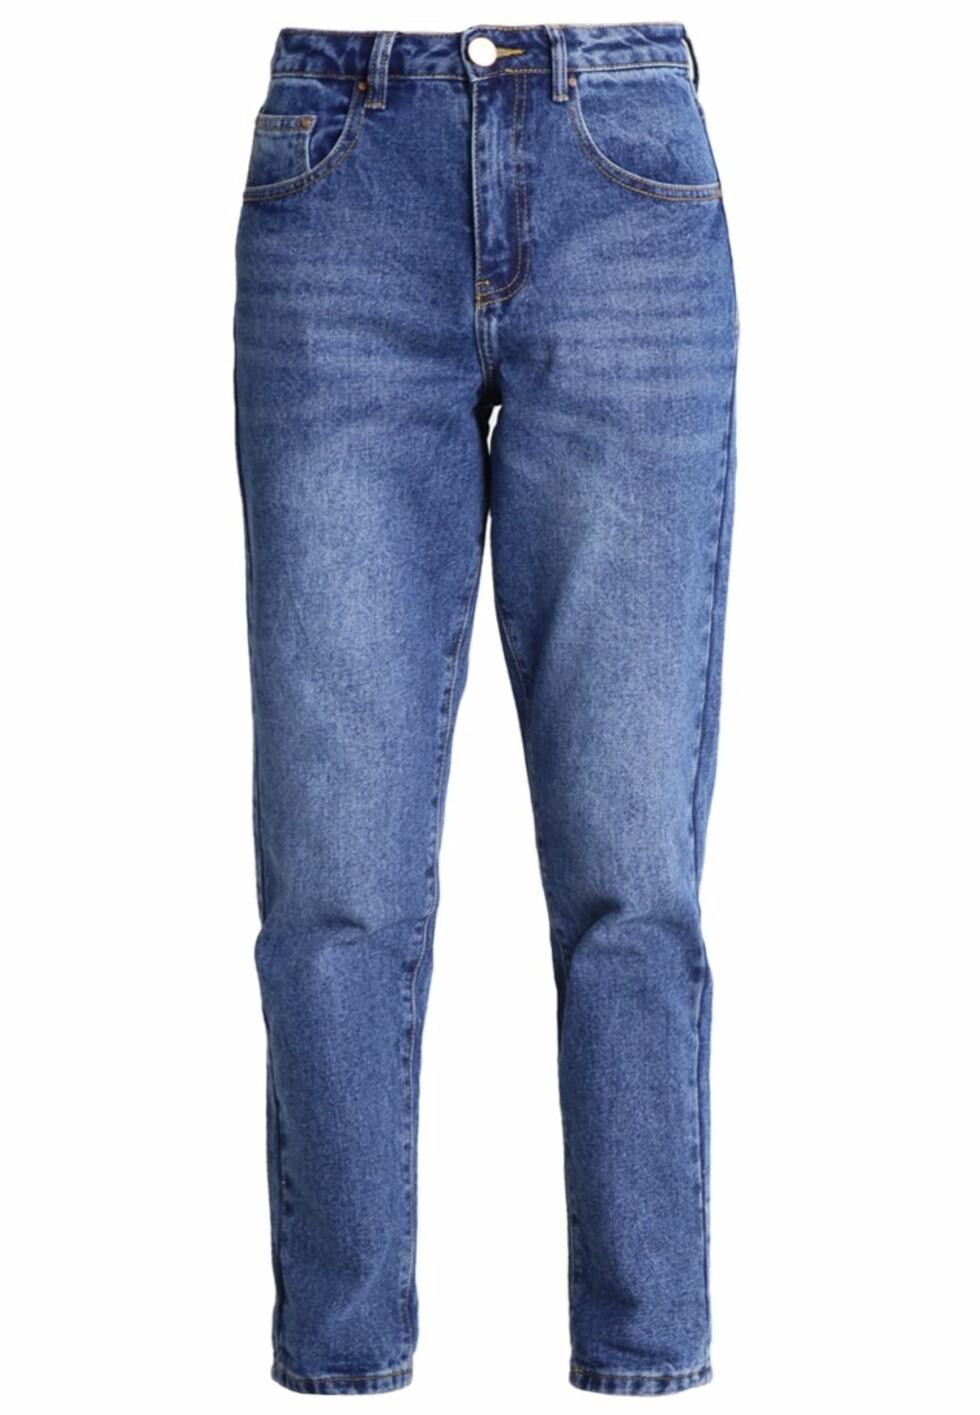 Jeans fra Lost Ink via Zalando.no, kr 449.